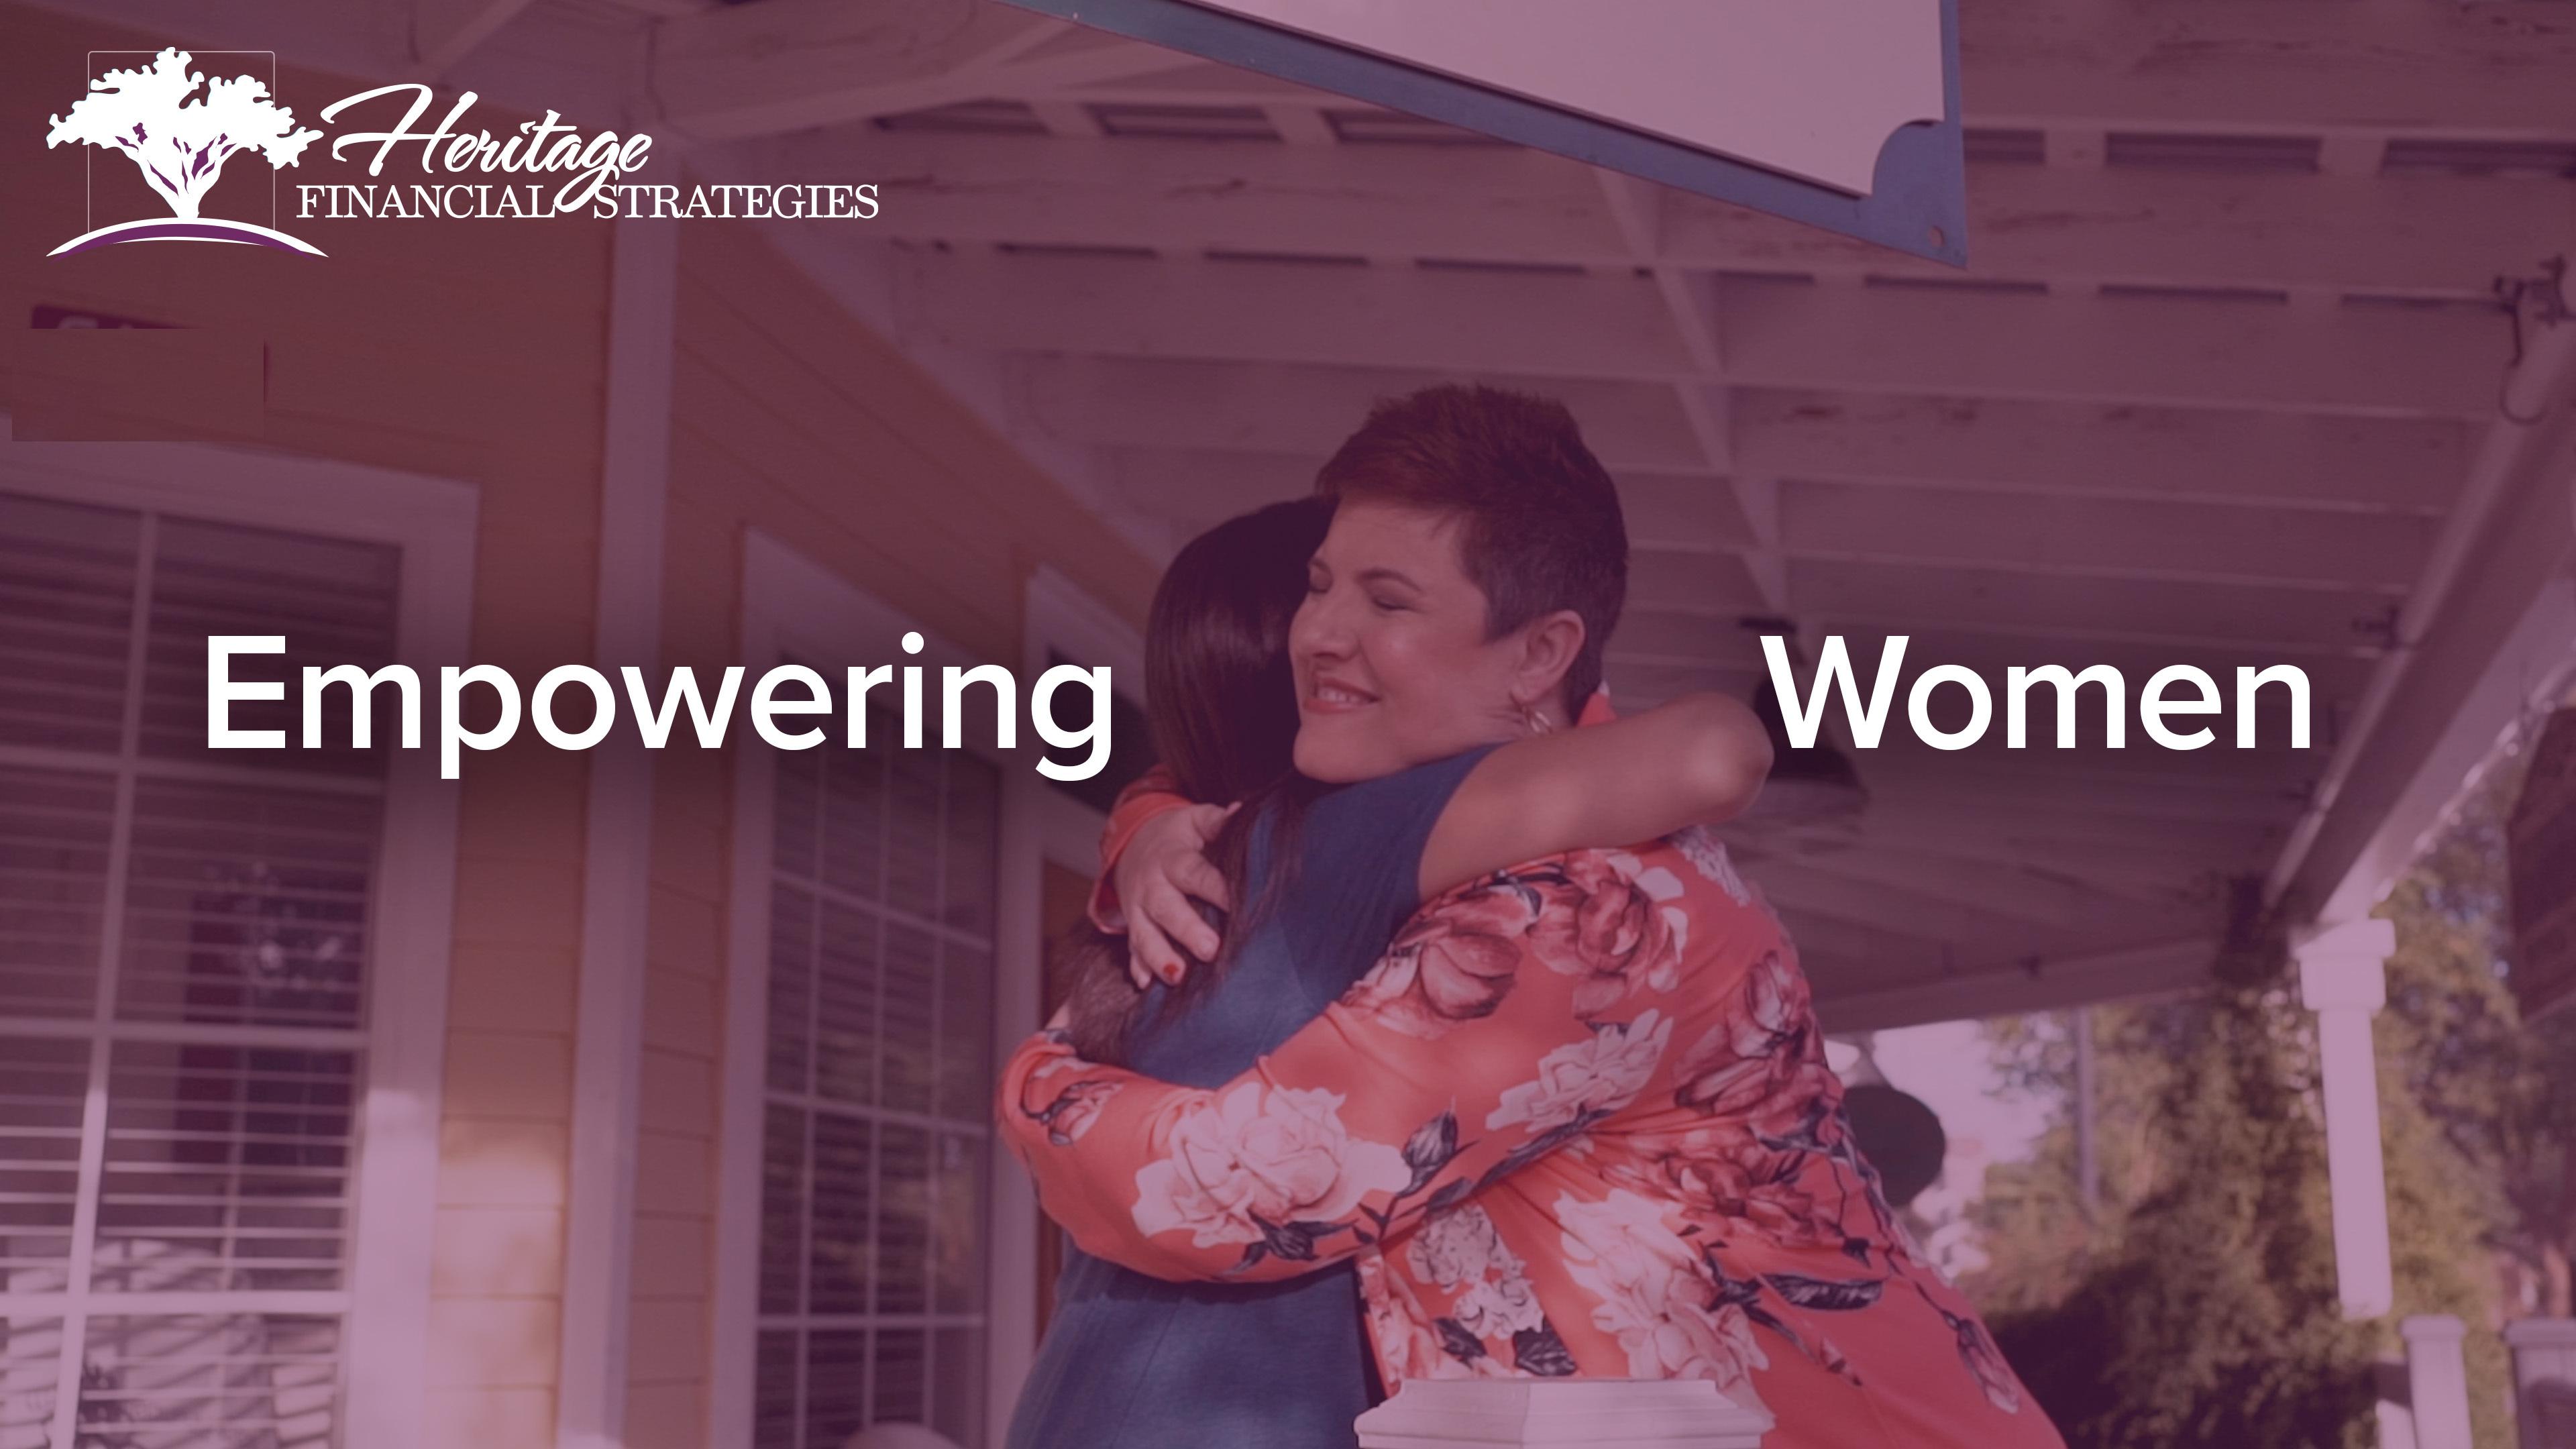 Empowering Women _ Heritage Financial Strategies